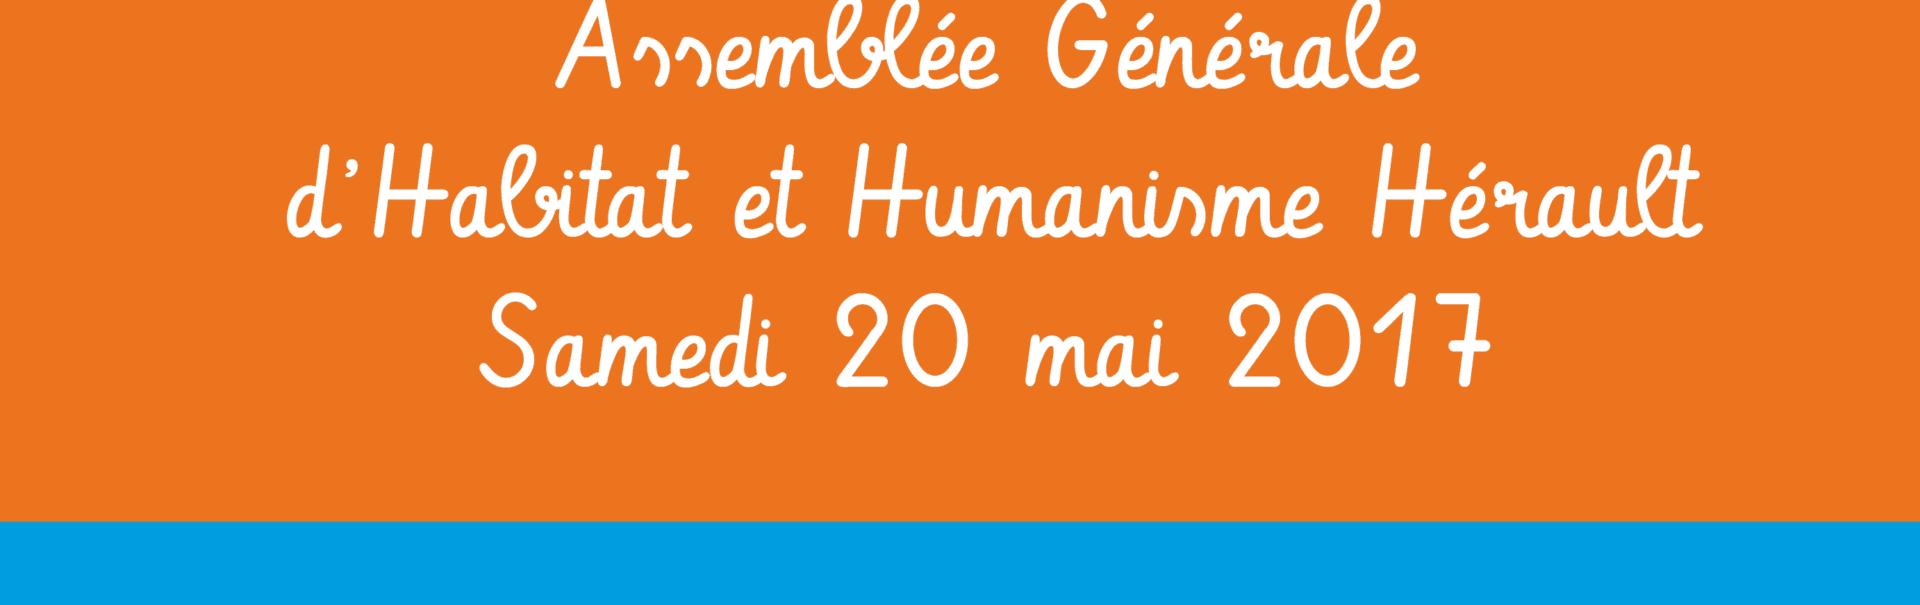 bandeau-AG-herault.png